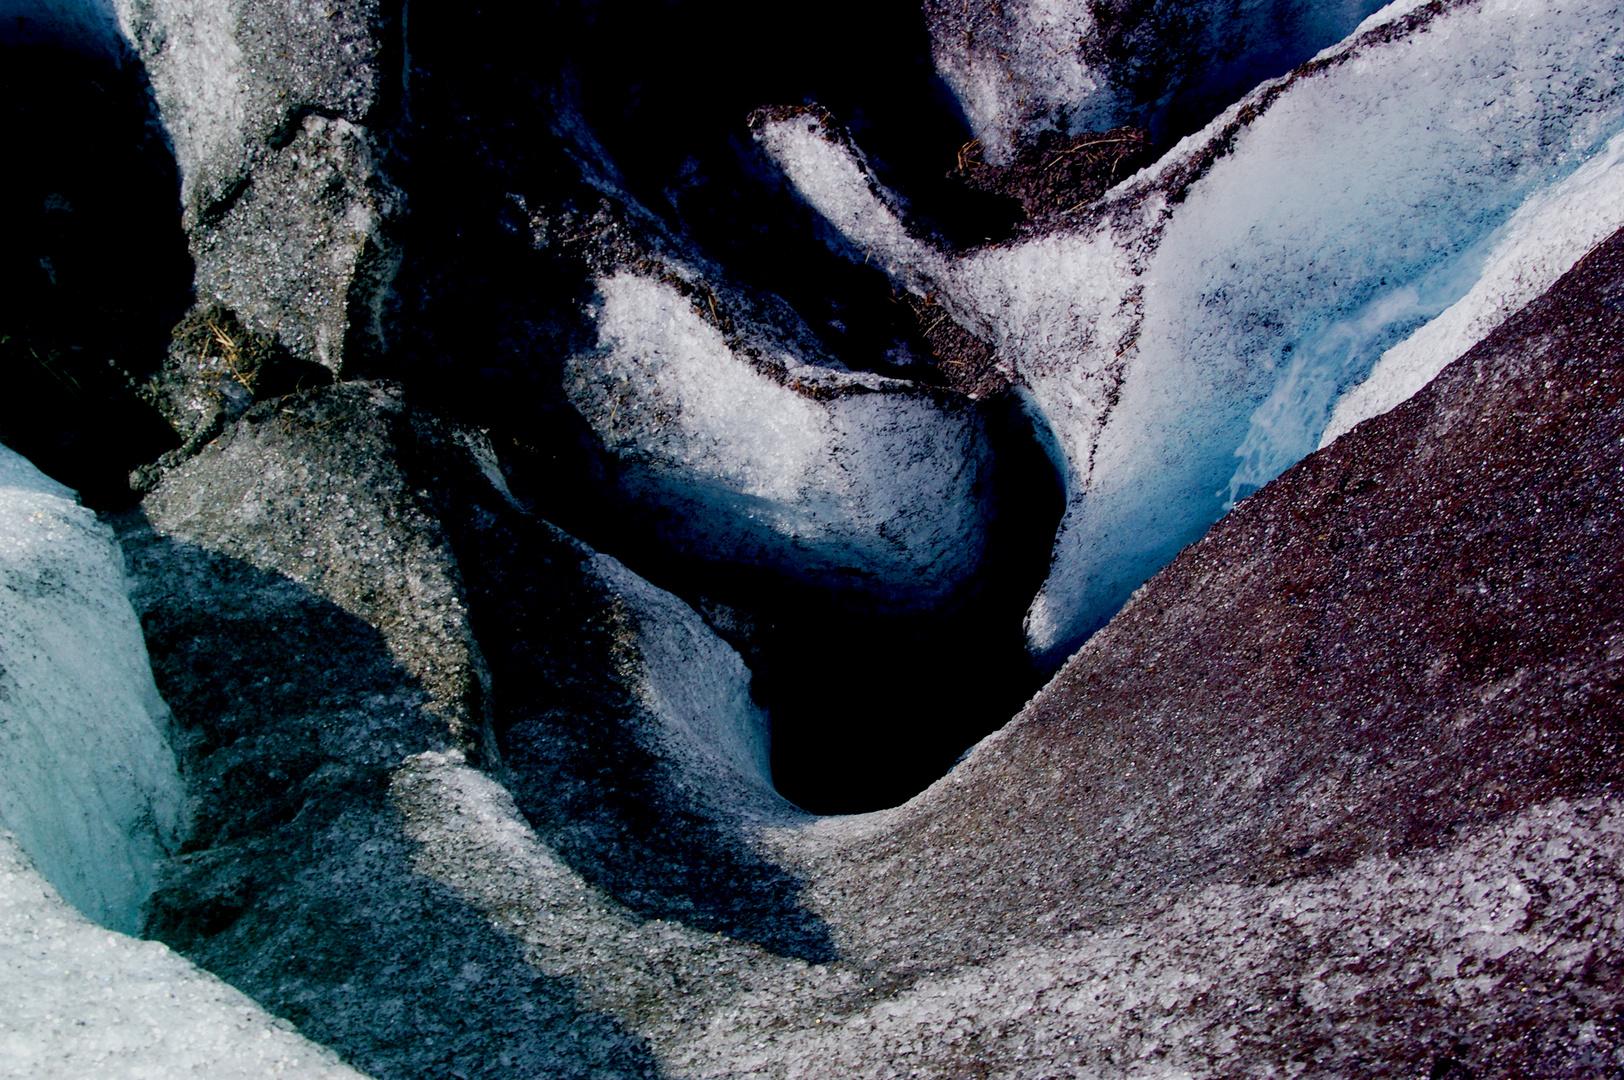 Vulkanausbruch - im Eis verewigt